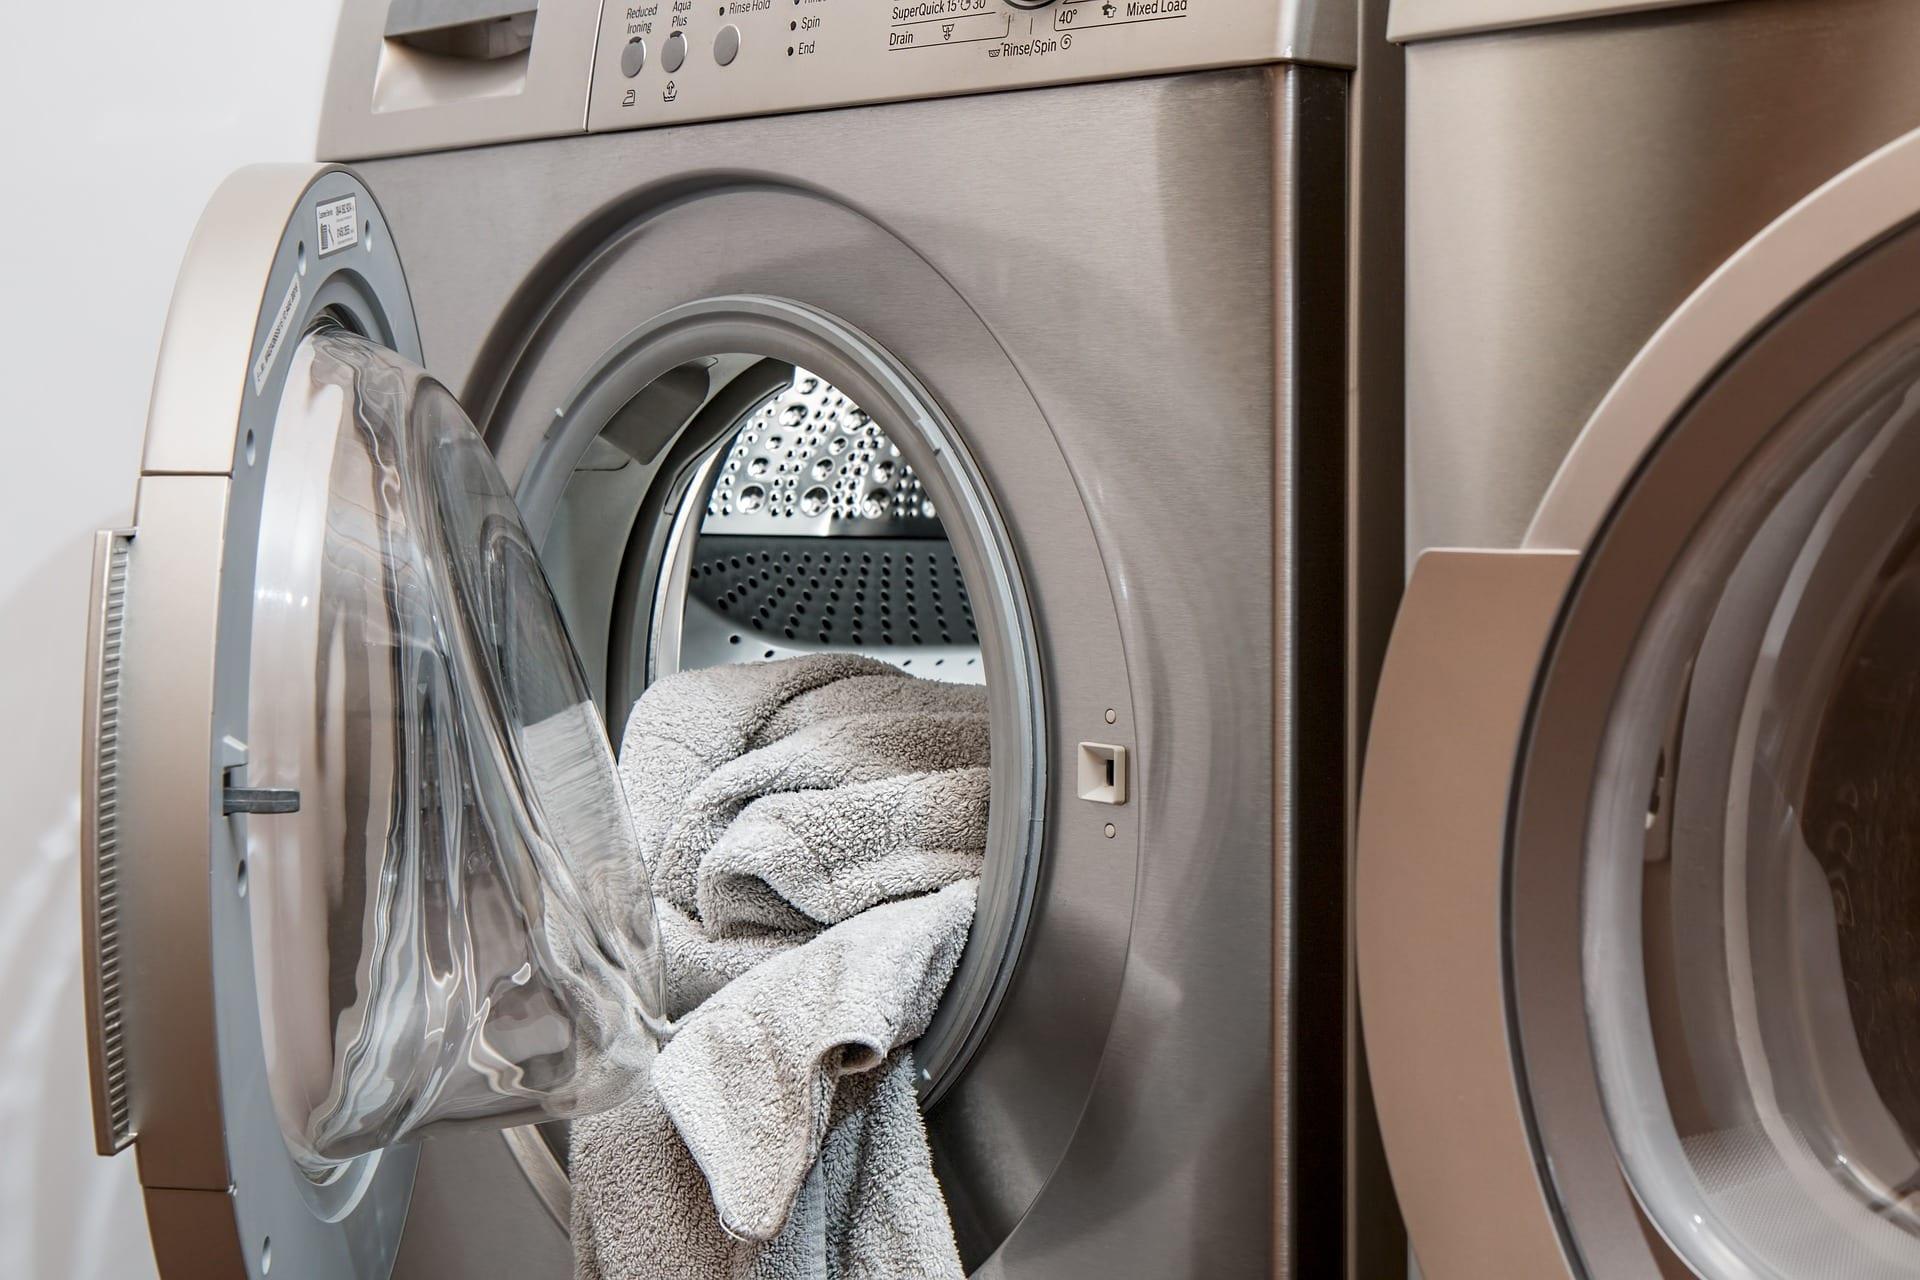 Towel inside washing machine